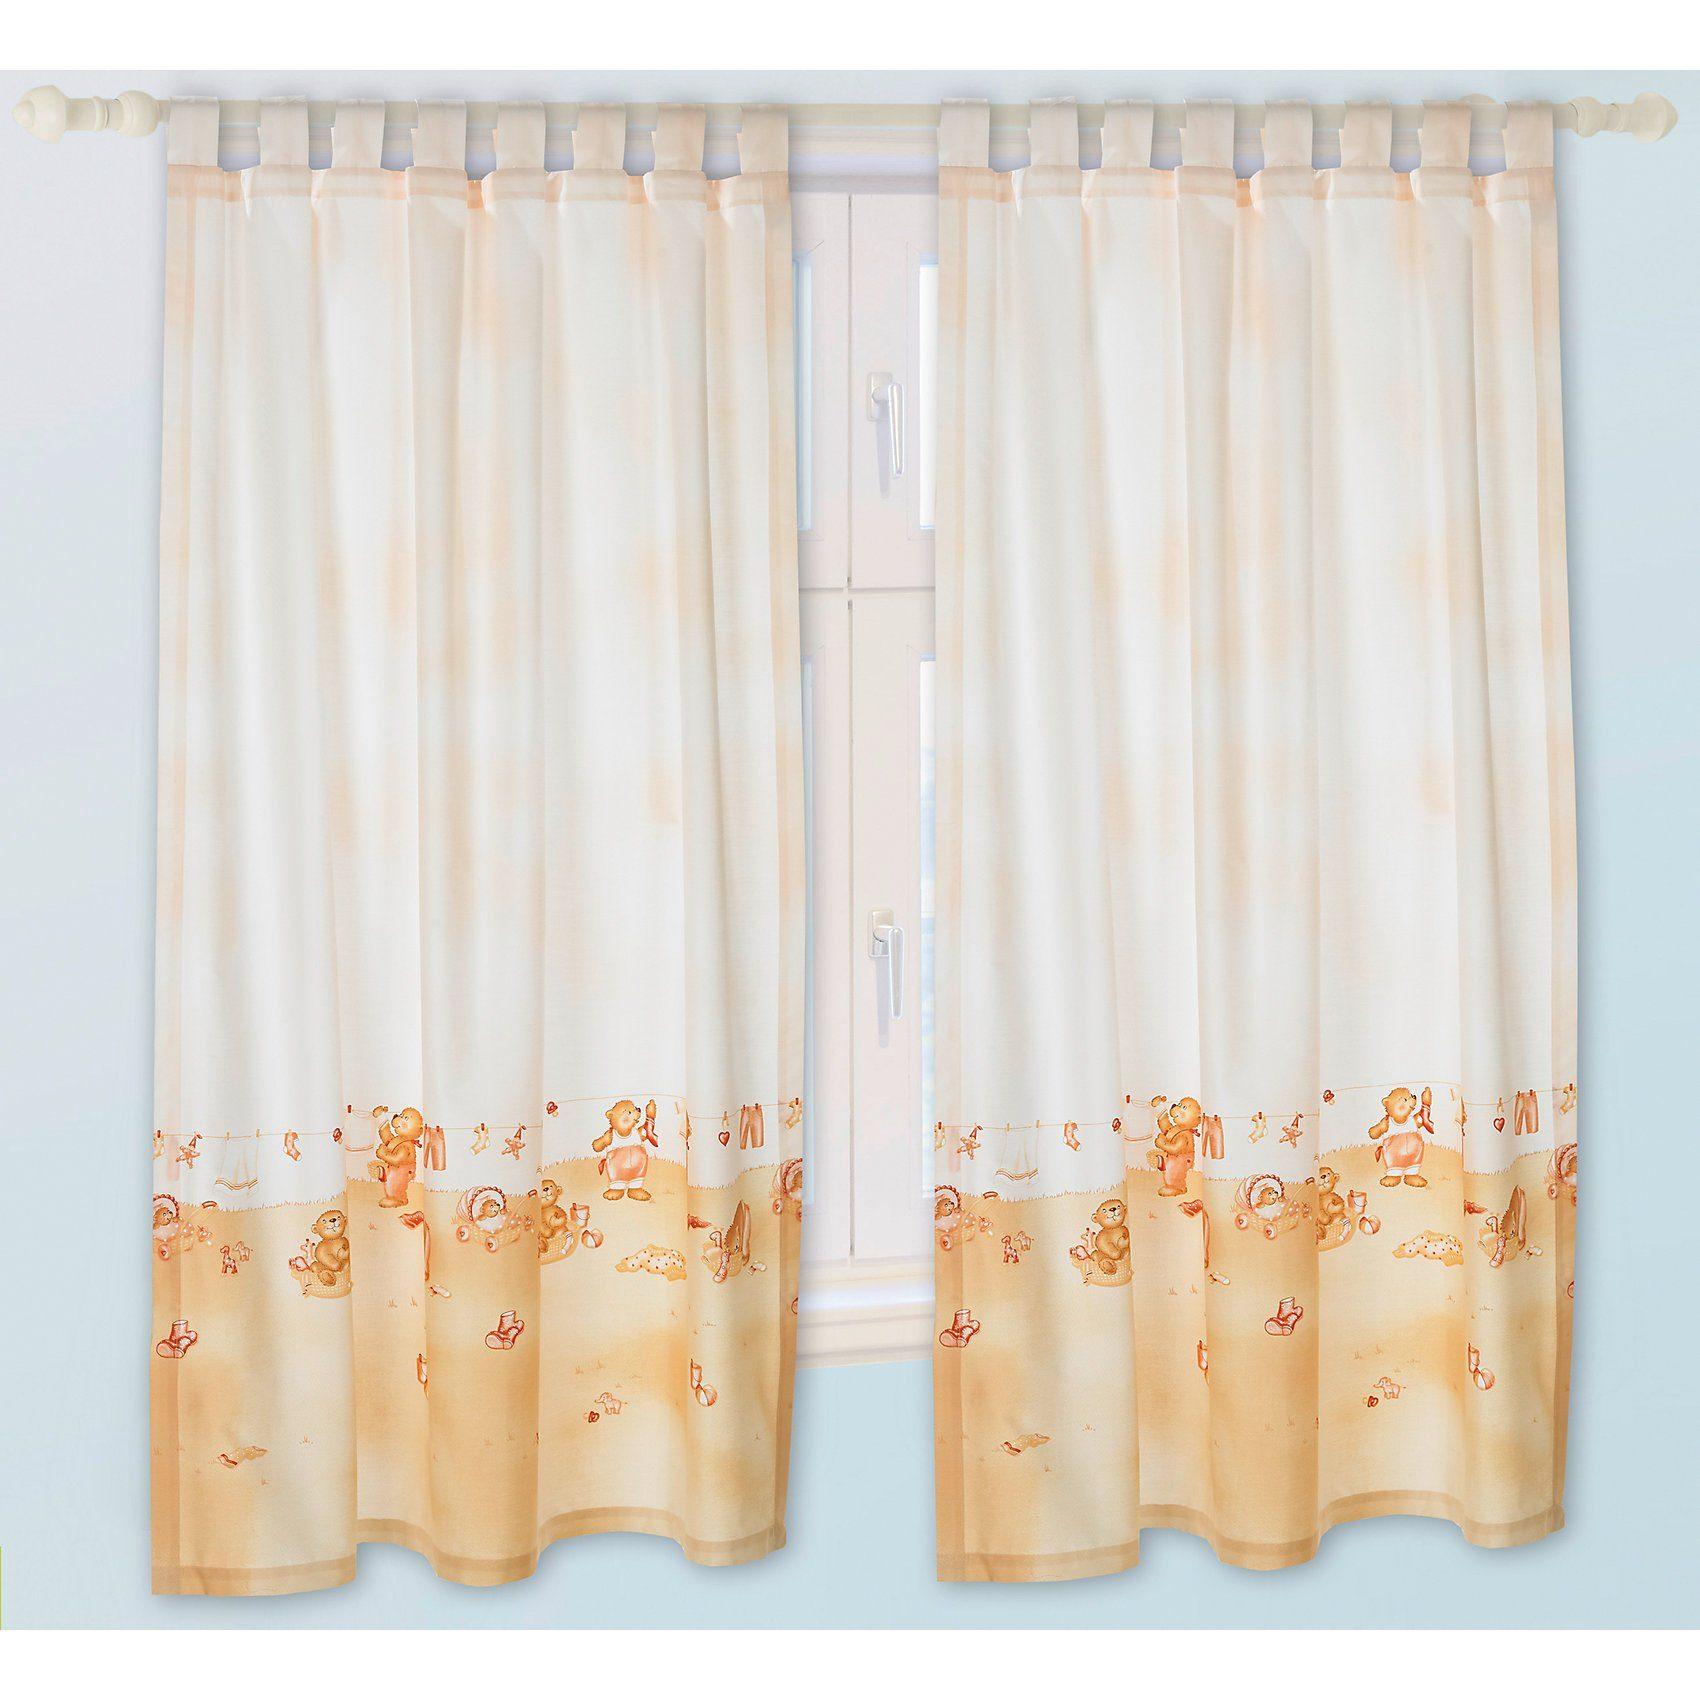 Alvi Vorhang Set Busy Bär beige je 130 x 150 cm (2 Schals)